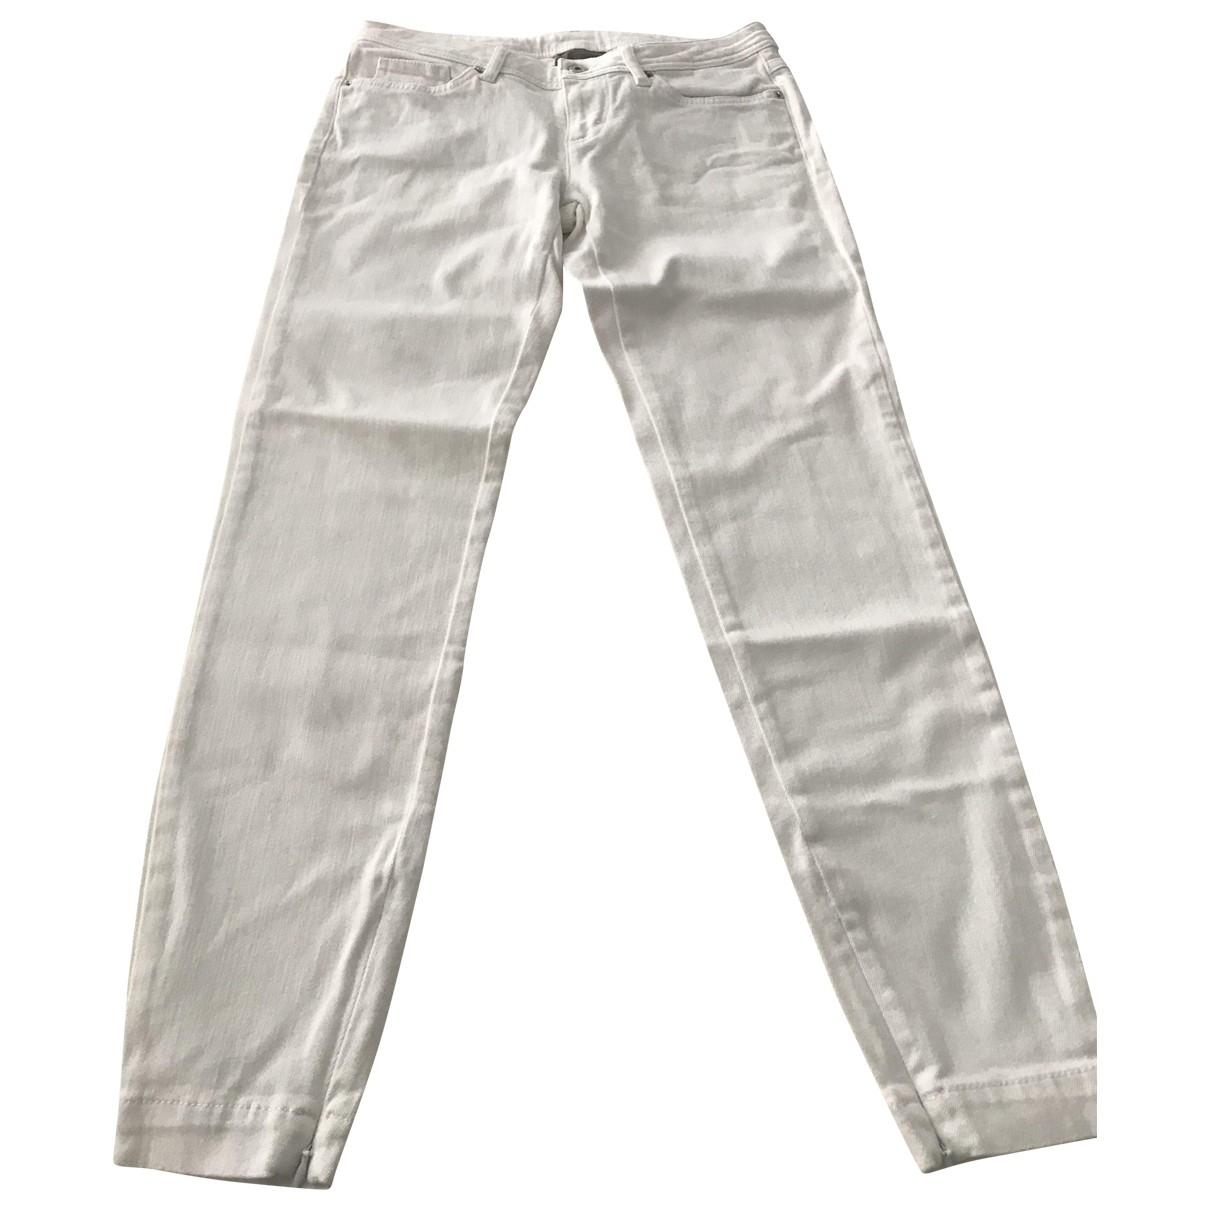 D&g \N White Cotton Trousers for Women S International